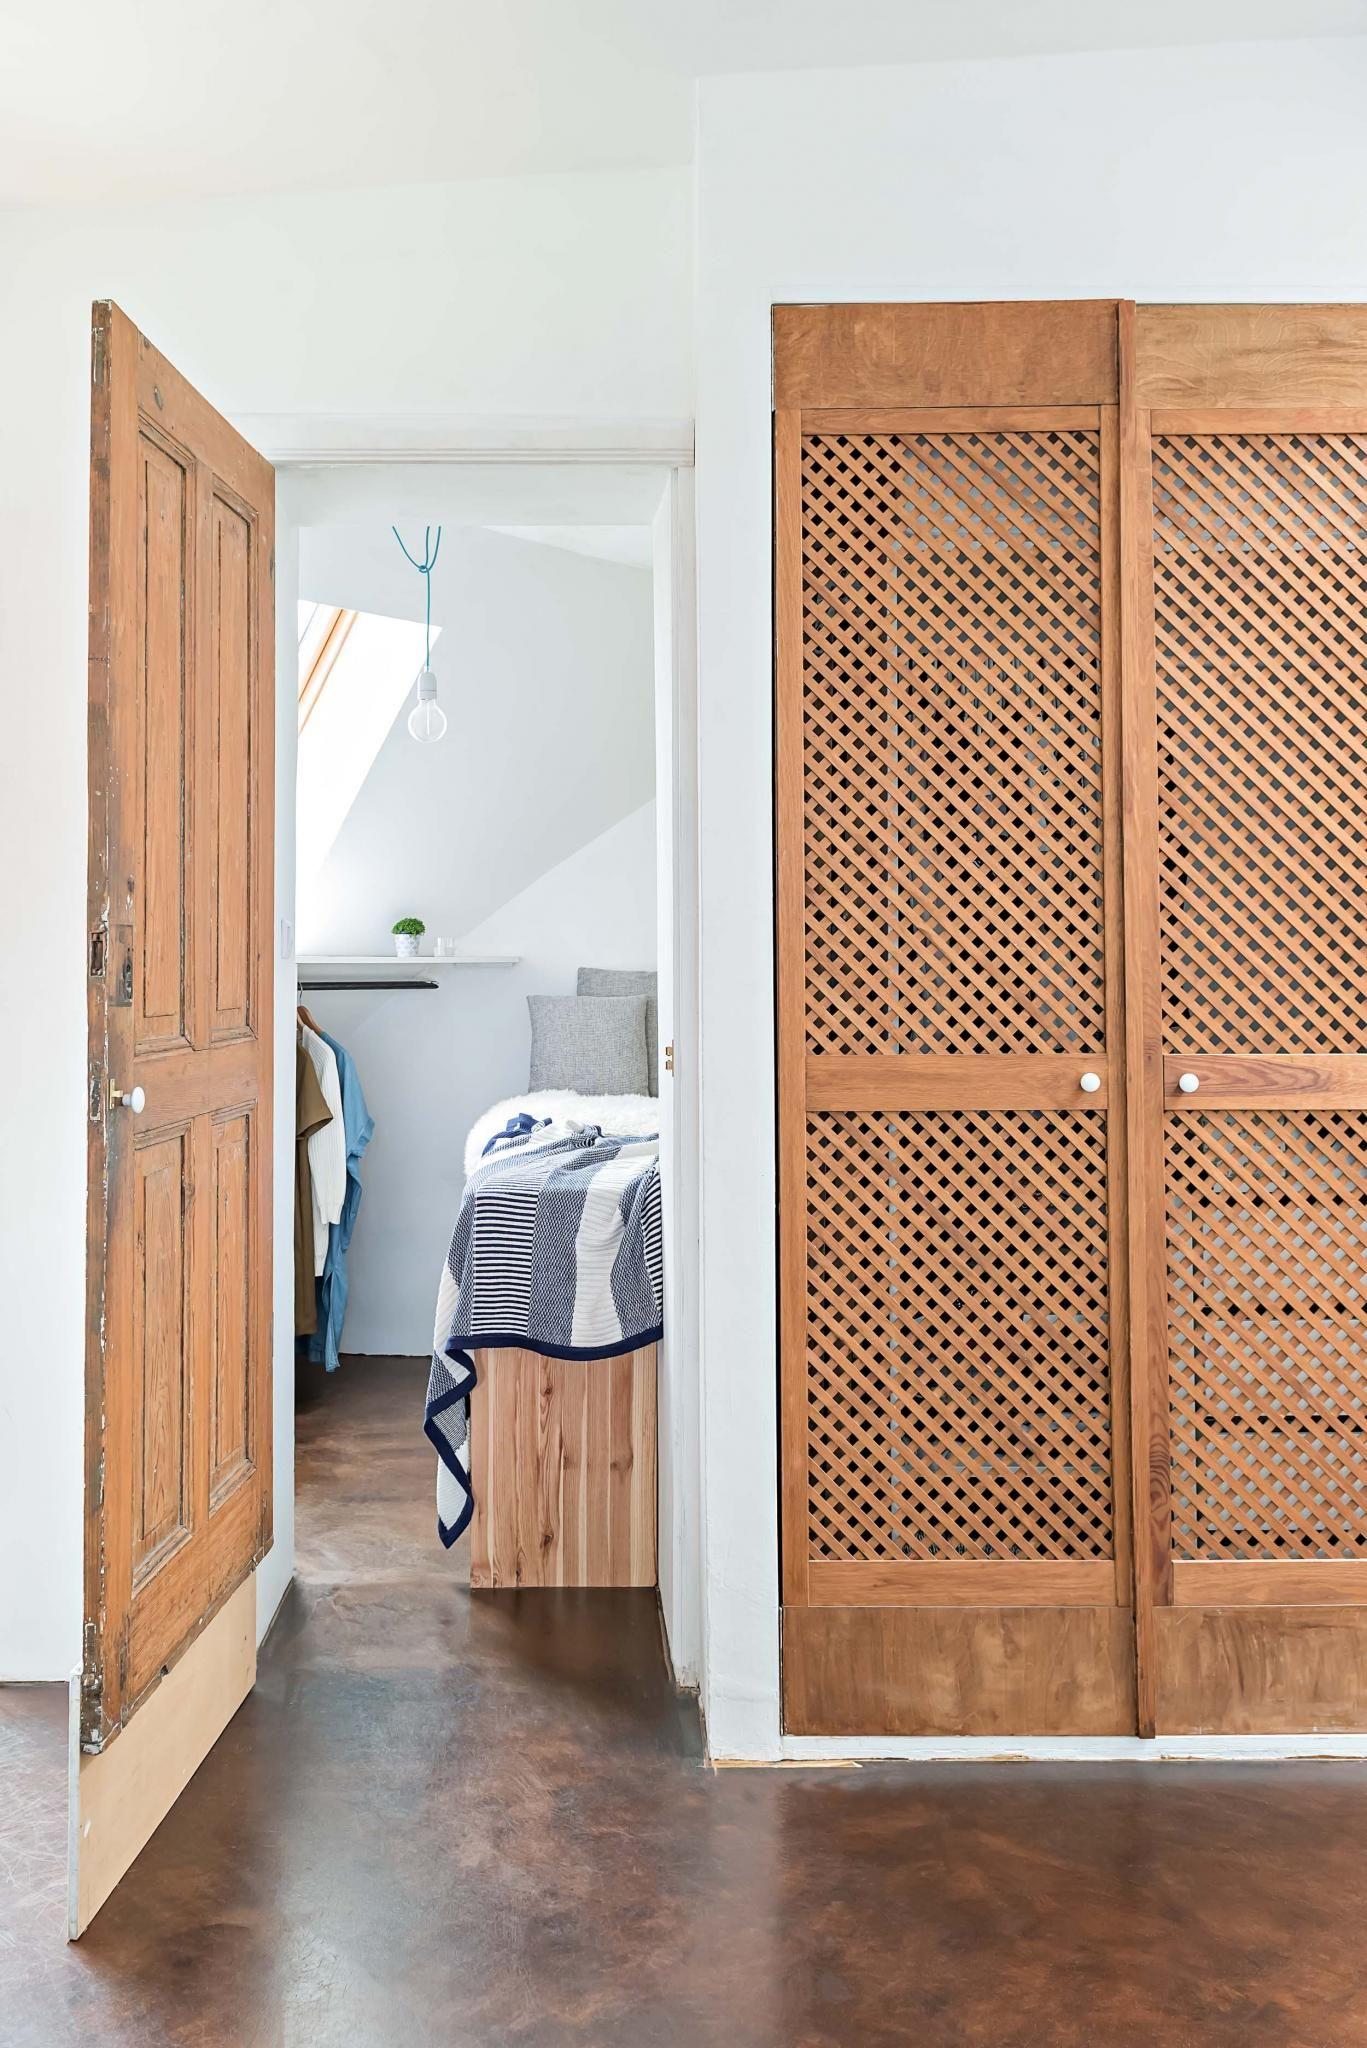 Bedroom Dresdener Strasse 117 Fantastic Frank Schlafzimmer Design Produktdesign Wohnen